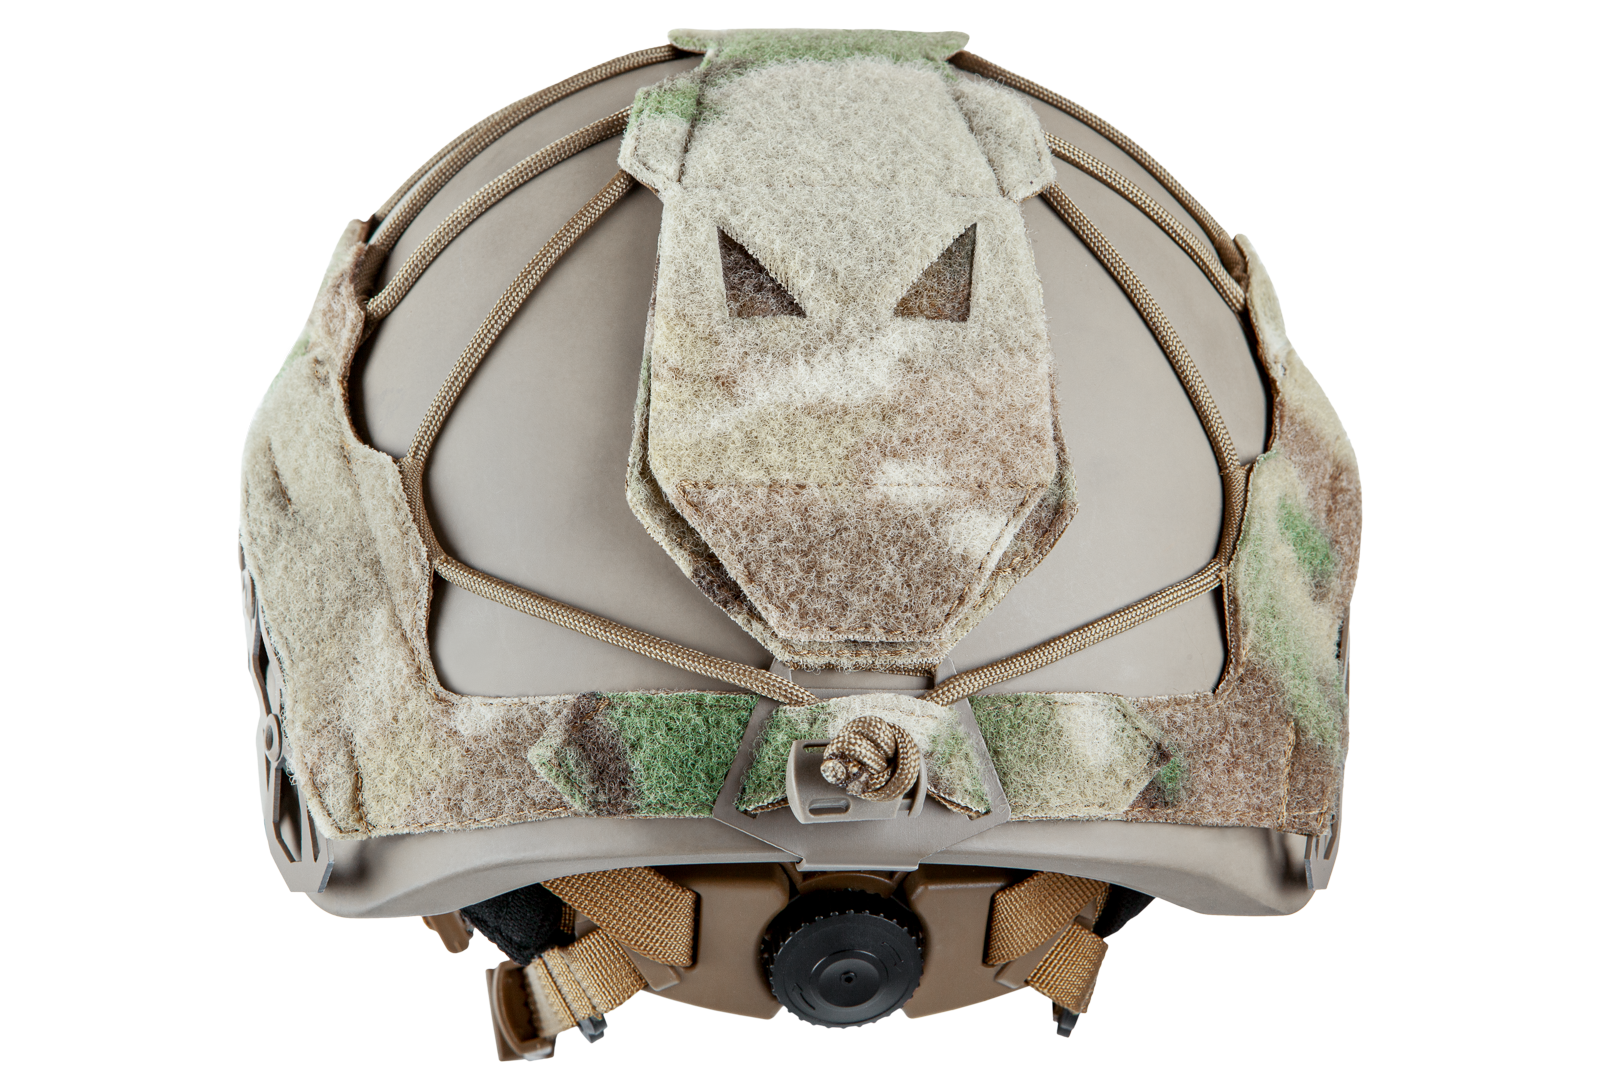 BHBH™ Boltless High-Cut Ballistic Helmet